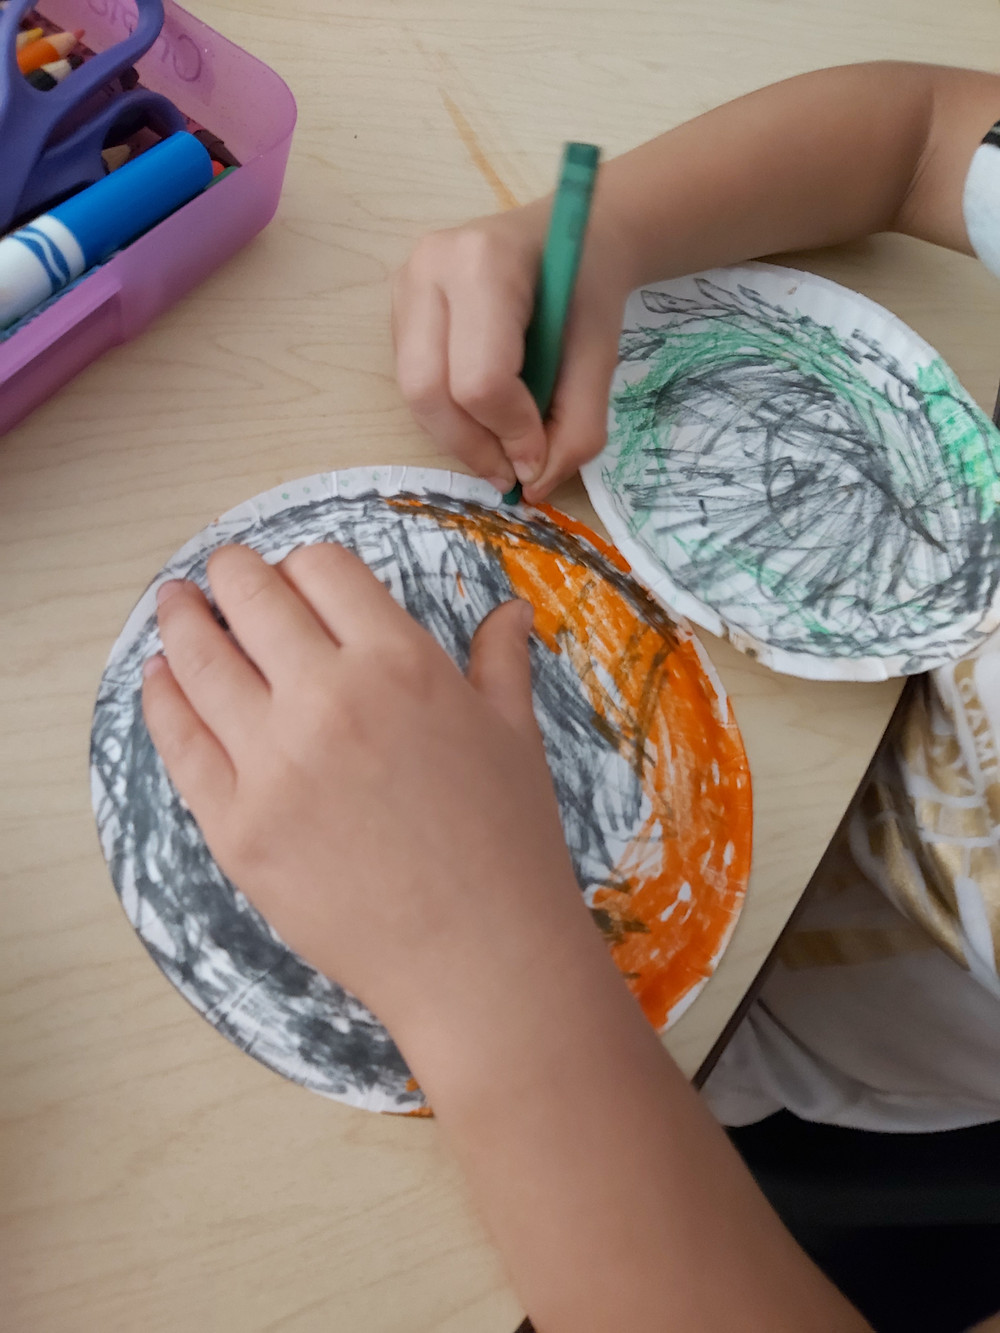 preschooler coloring two paper plates